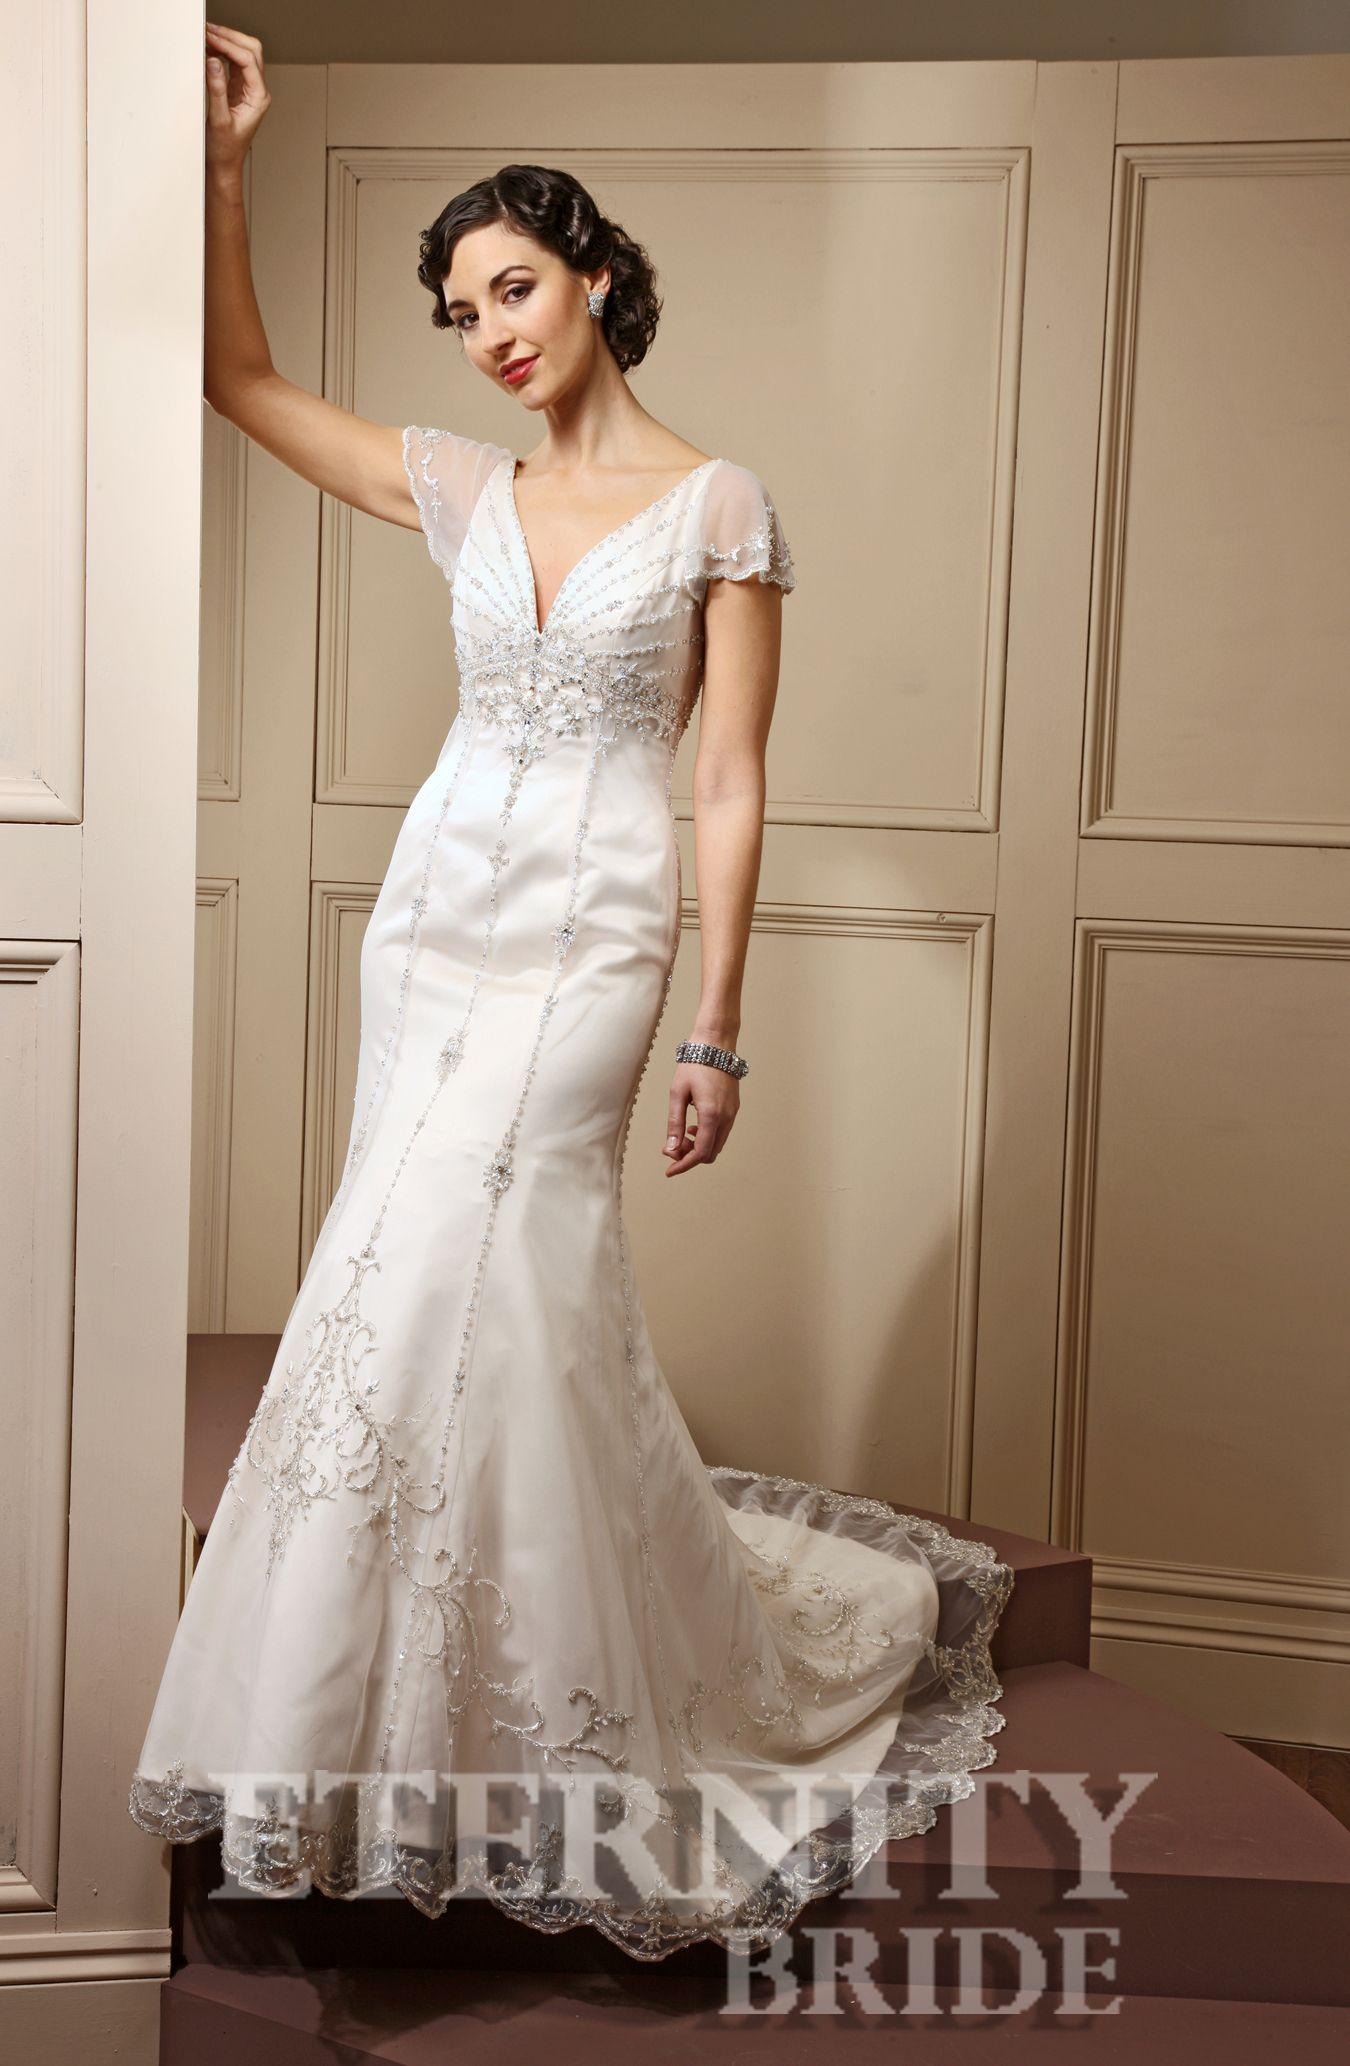 1930s style wedding dresses  Eternity bride   Toni bridal  Pinterest  Bridal dresses